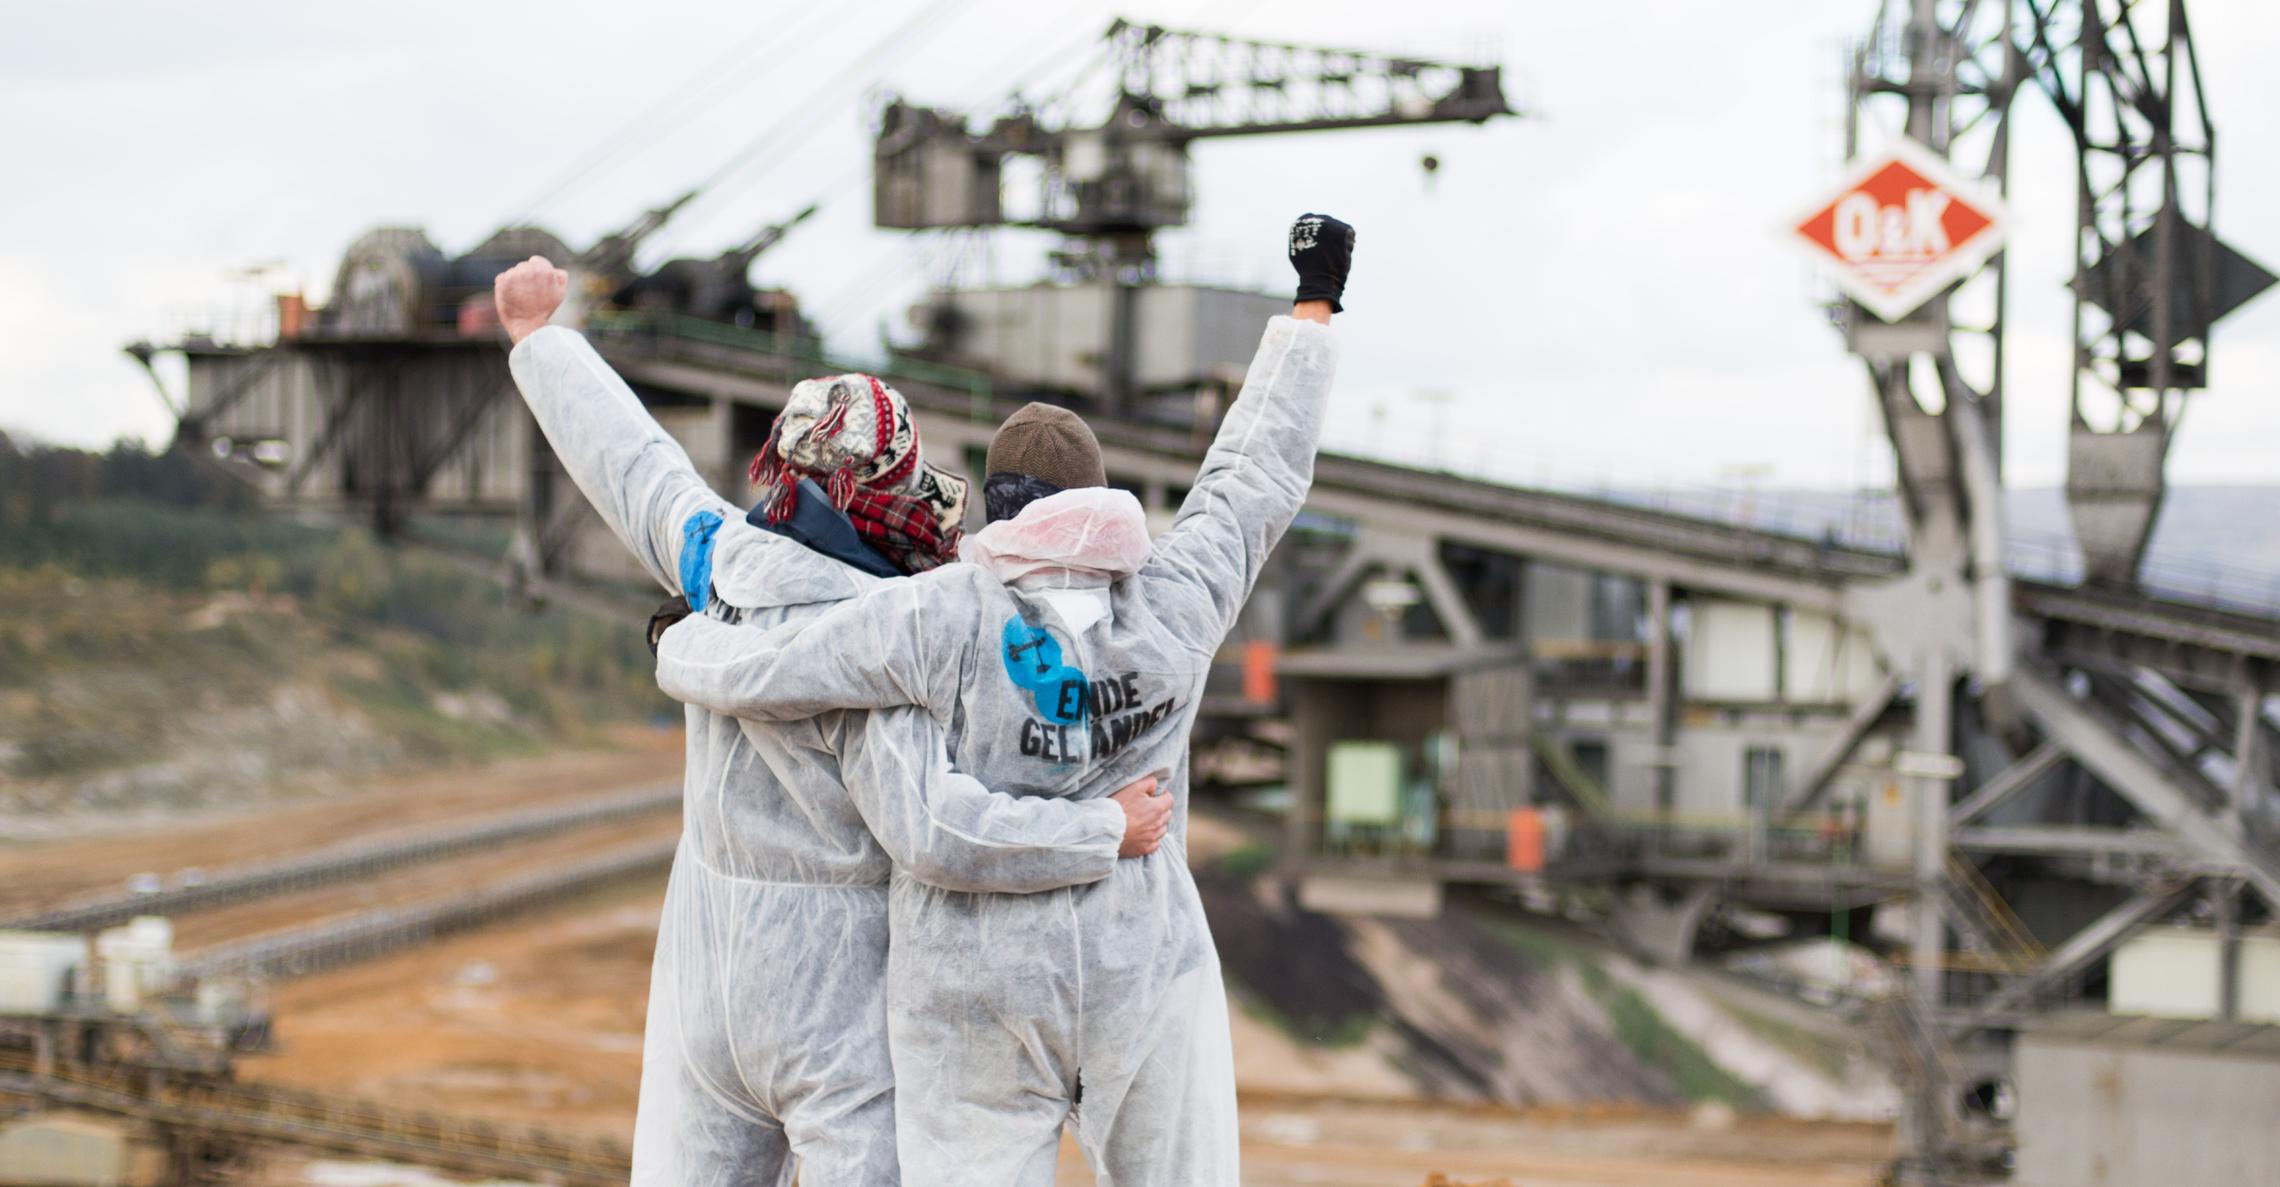 Aktivisten demonstrieren gegen Kohleabbau ©Roman Kutzowitz